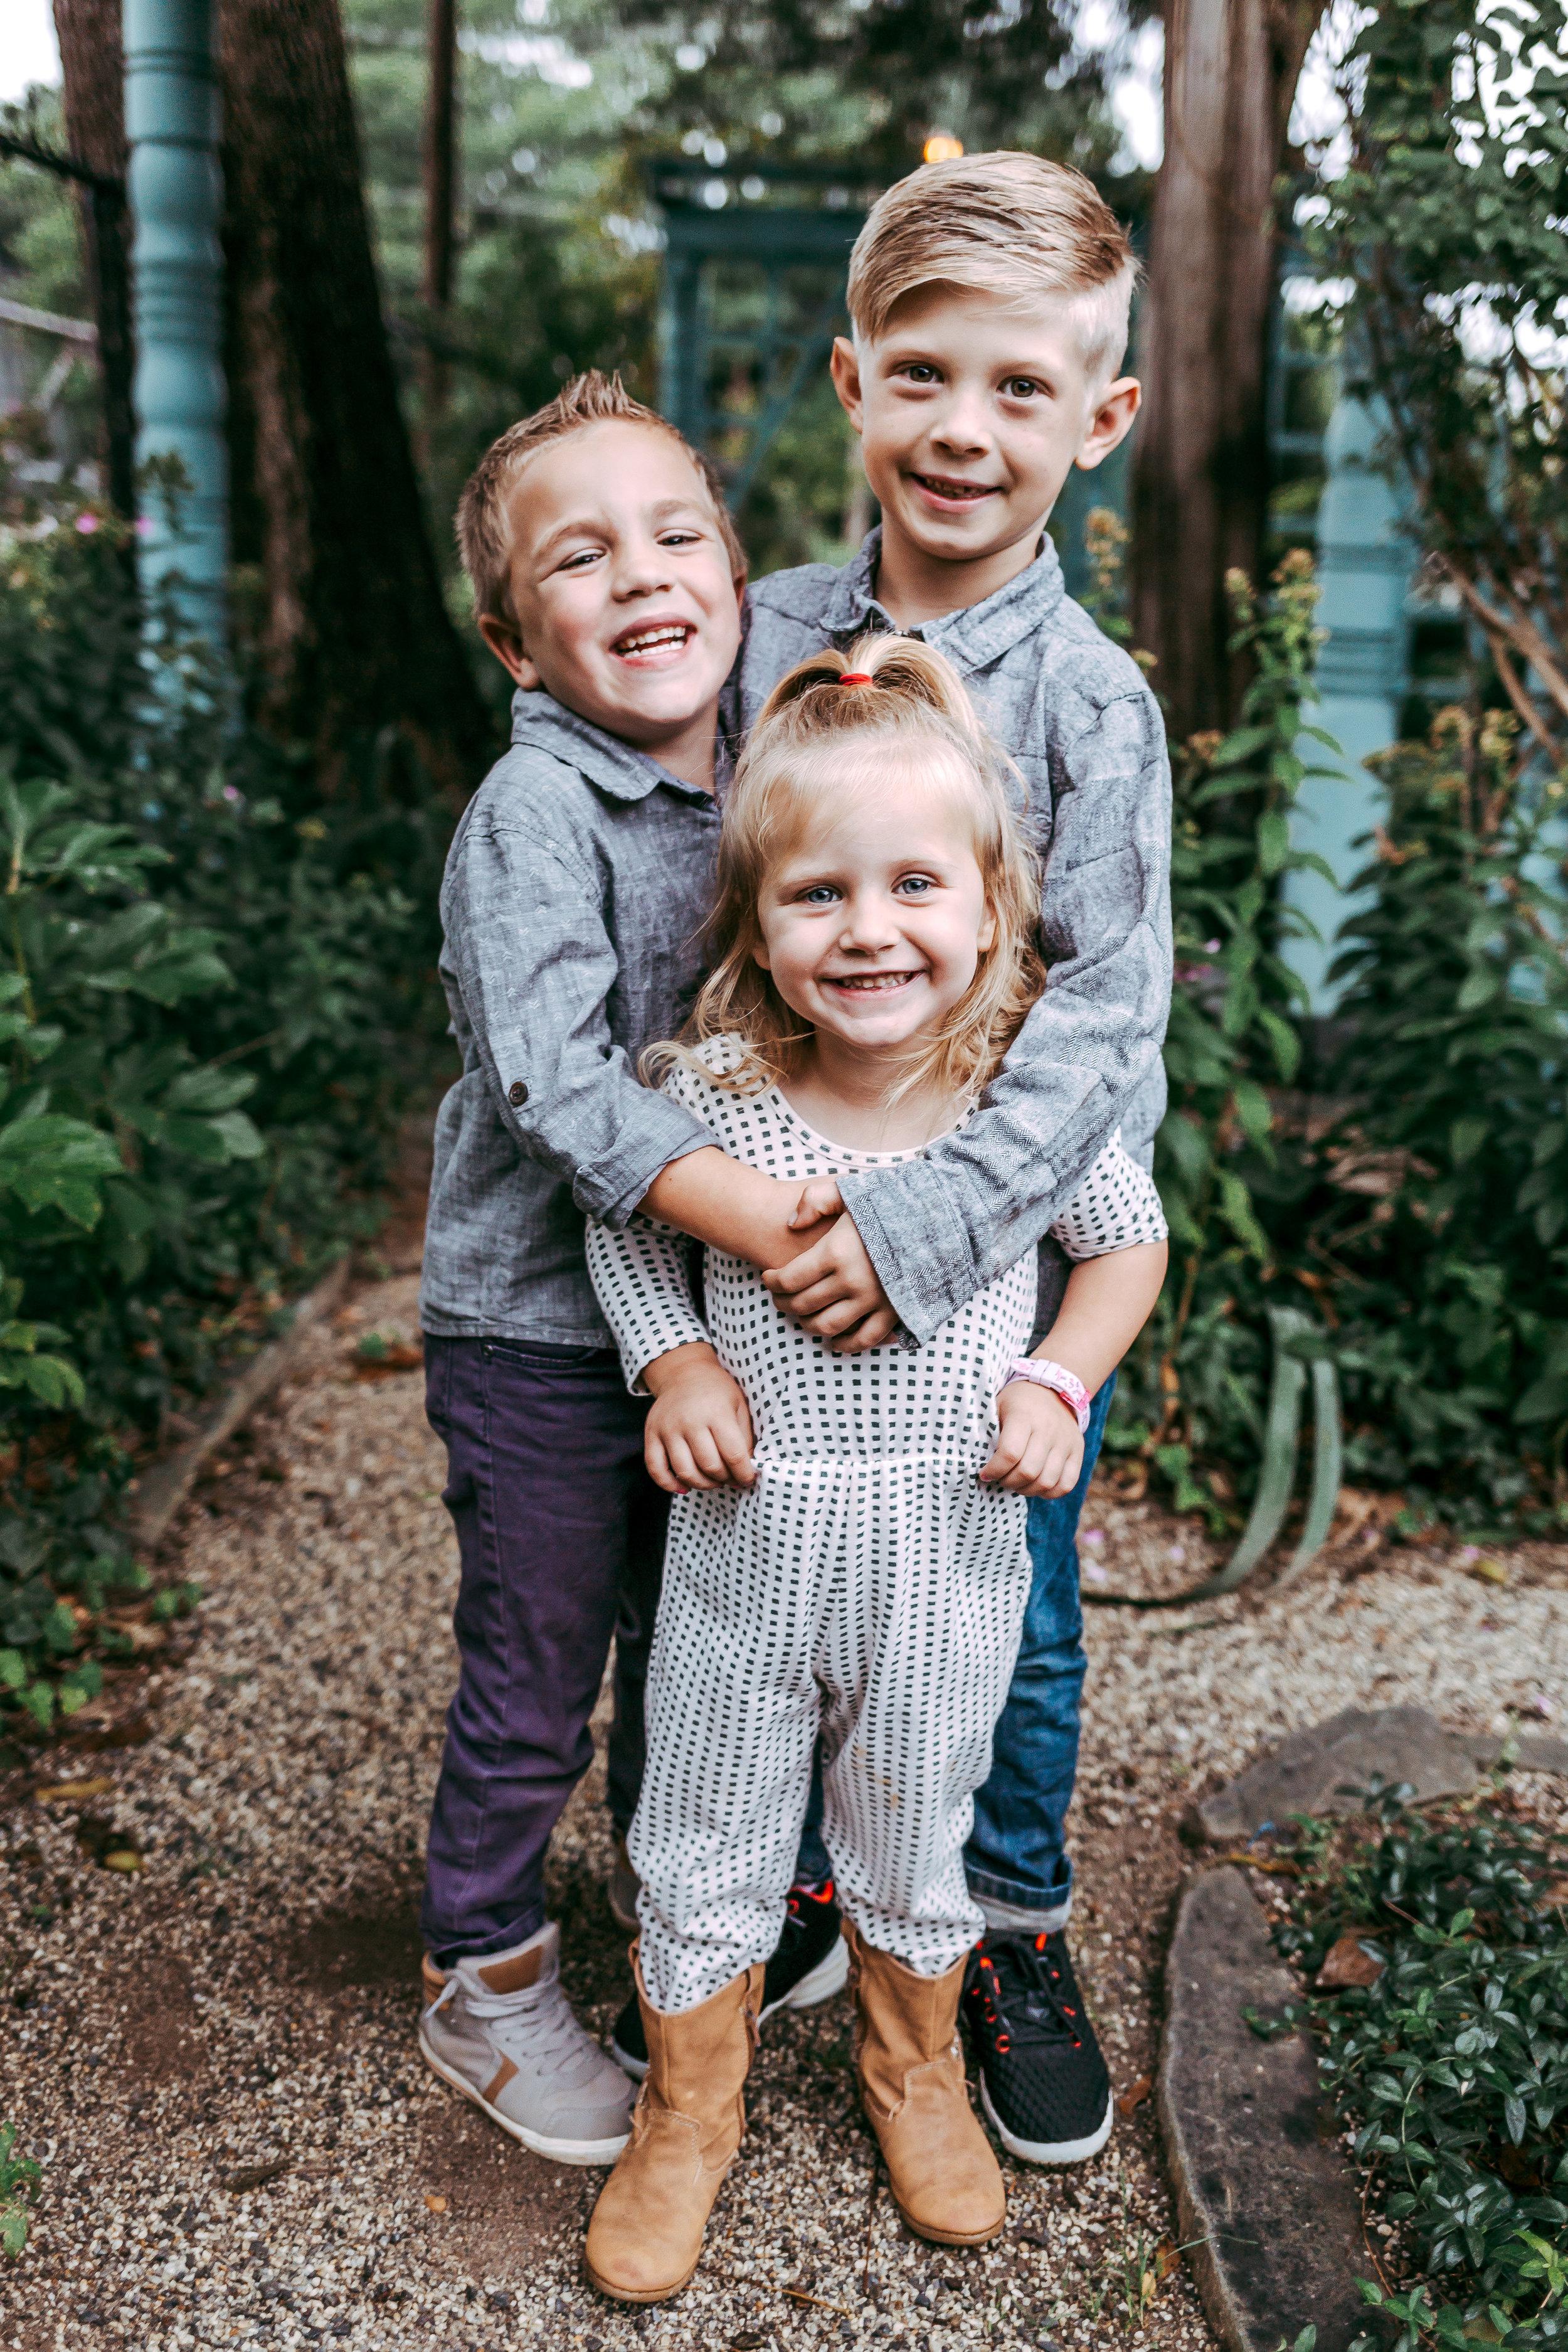 Family Photographer in Lynchburg, Virginia